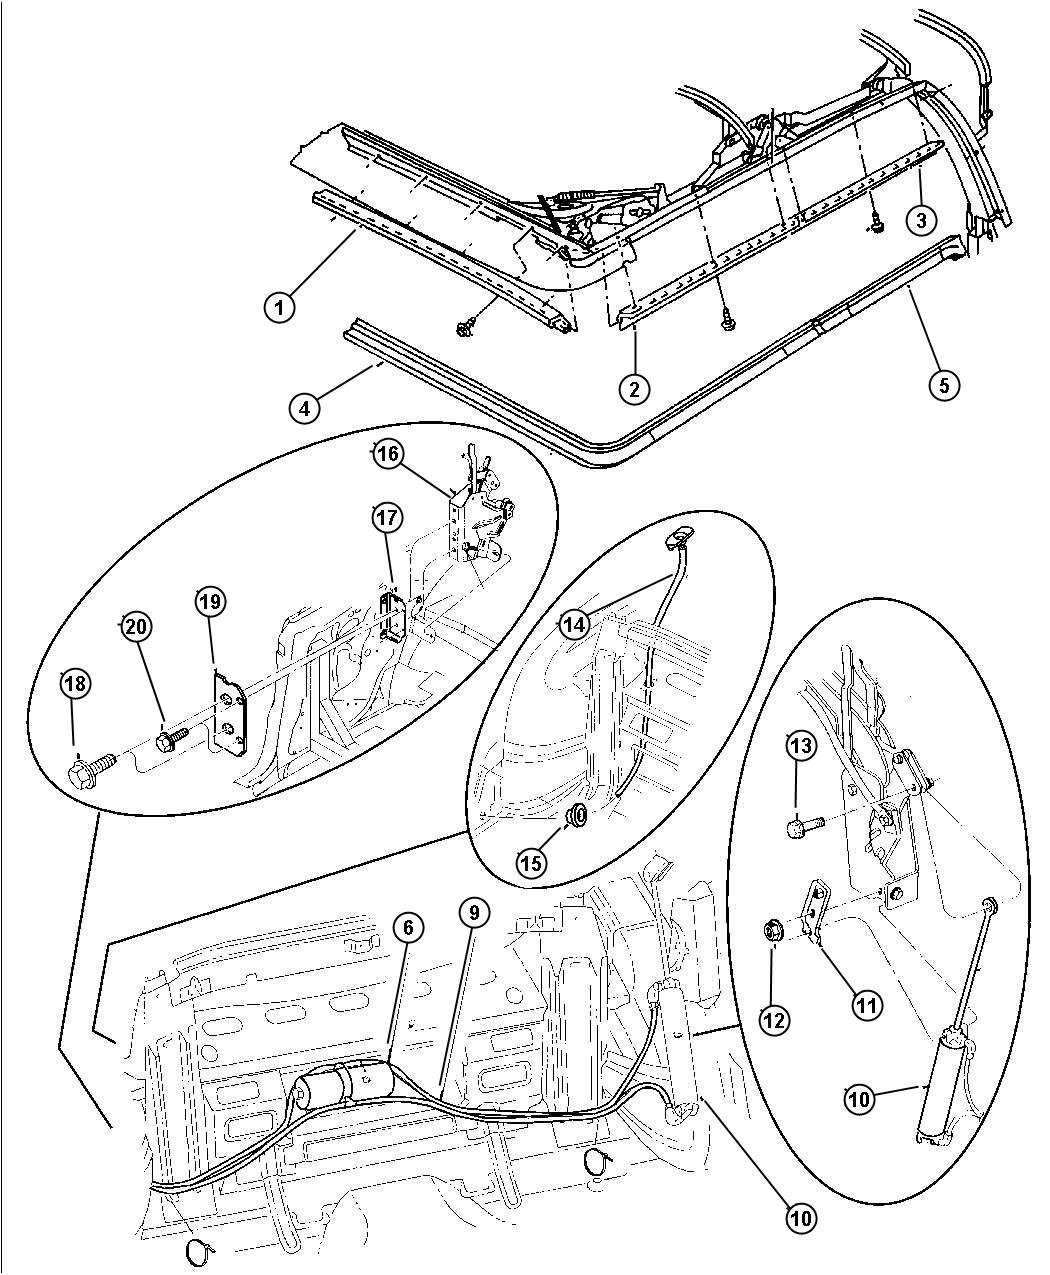 1997 Chrysler Sebring Screw. Hex flange head. Top, folding